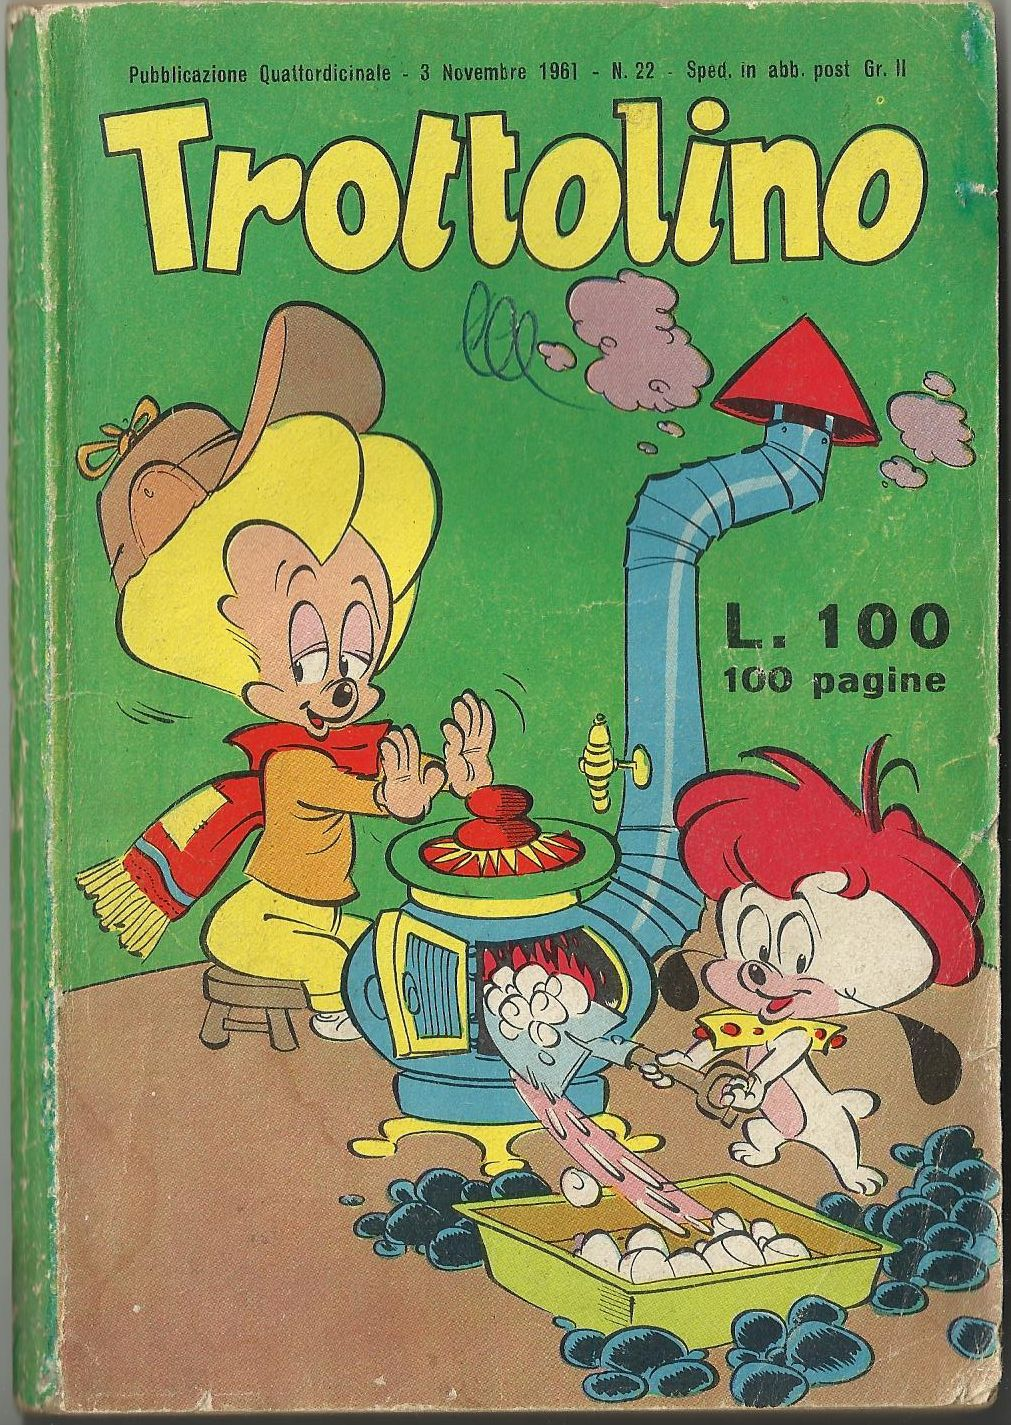 Trottolino n. 22